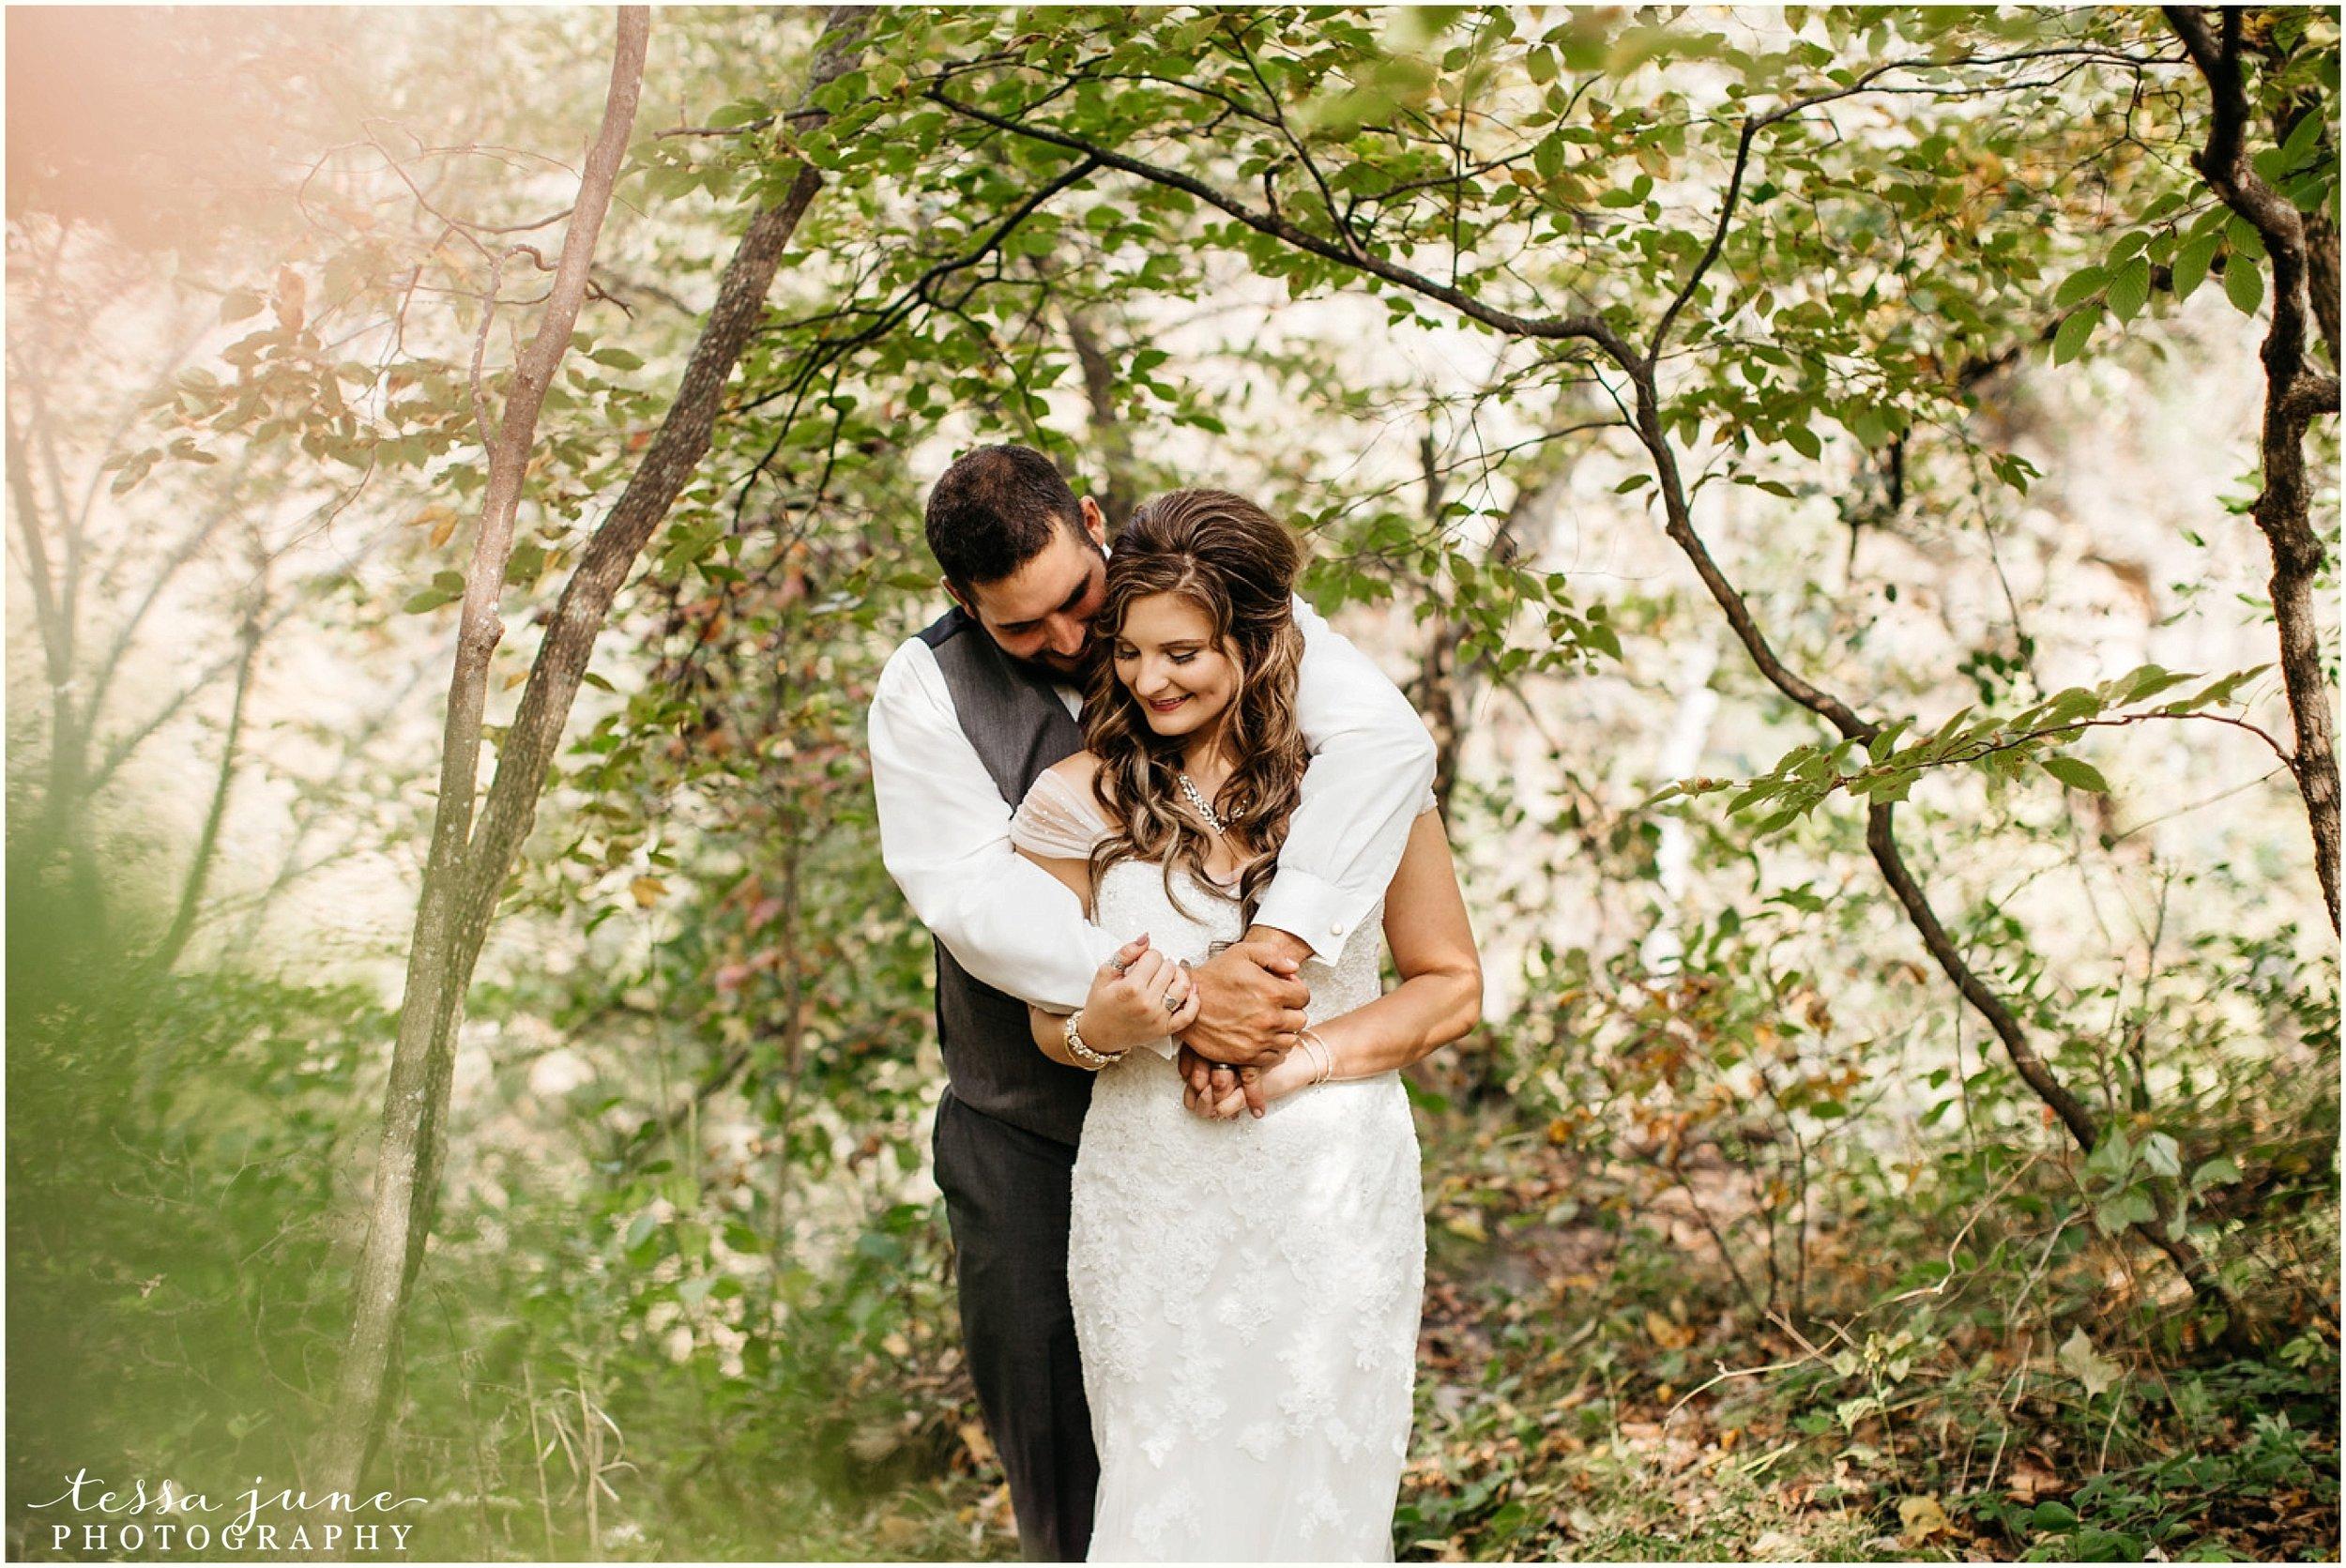 bohemian-minnesota-wedding-mismatched-bridesmaid-dresses-waterfall-st-cloud-tessa-june-photography-49.jpg